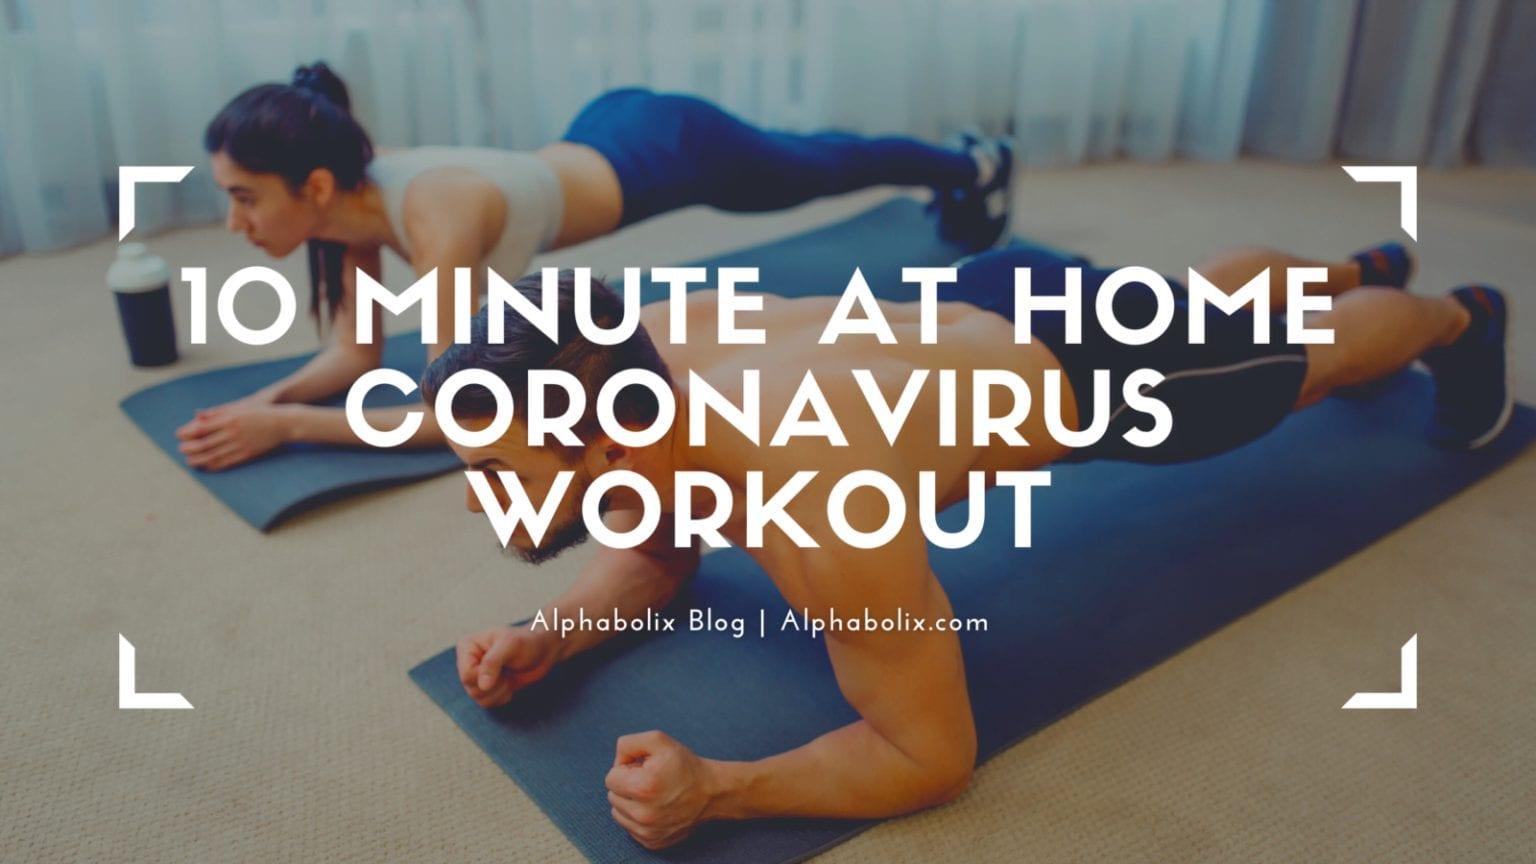 10 Minute At Home Coronavirus Workout